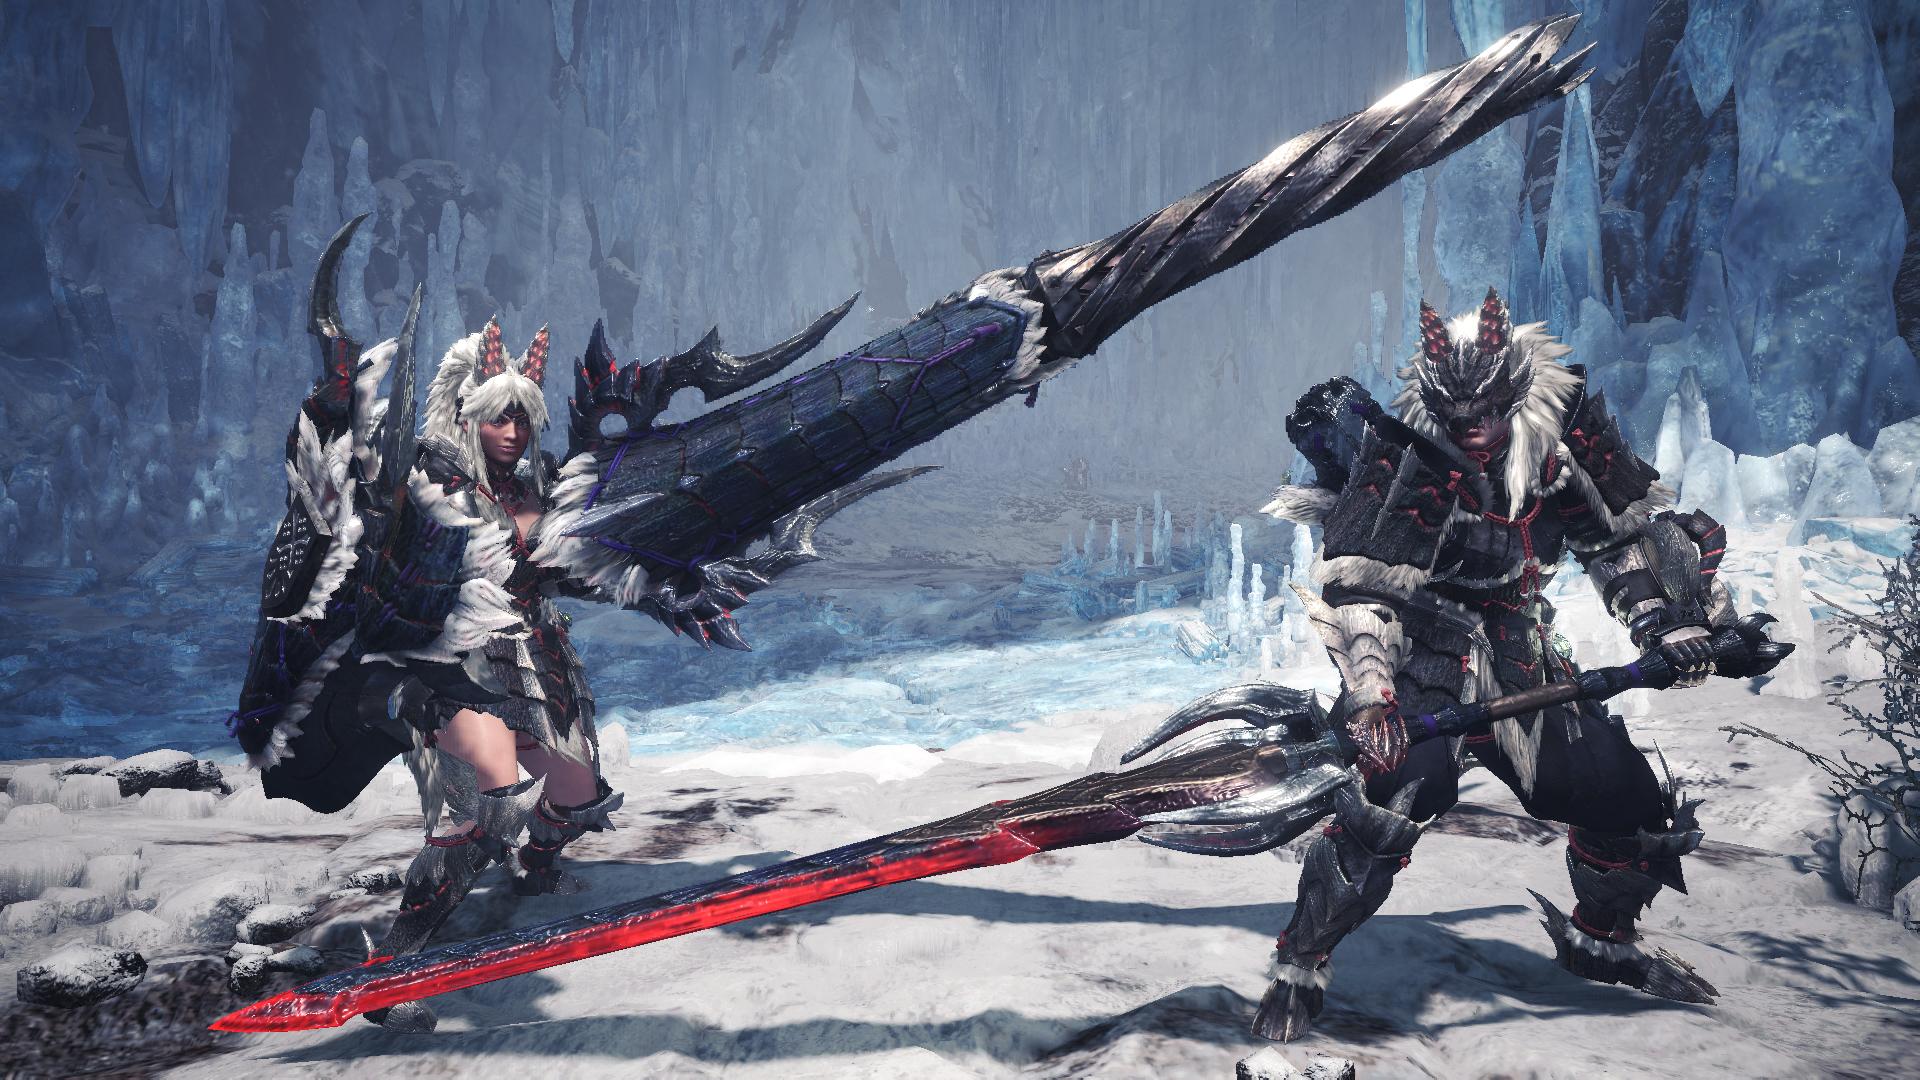 Monster Hunter World: Iceborne's second title update adds ...